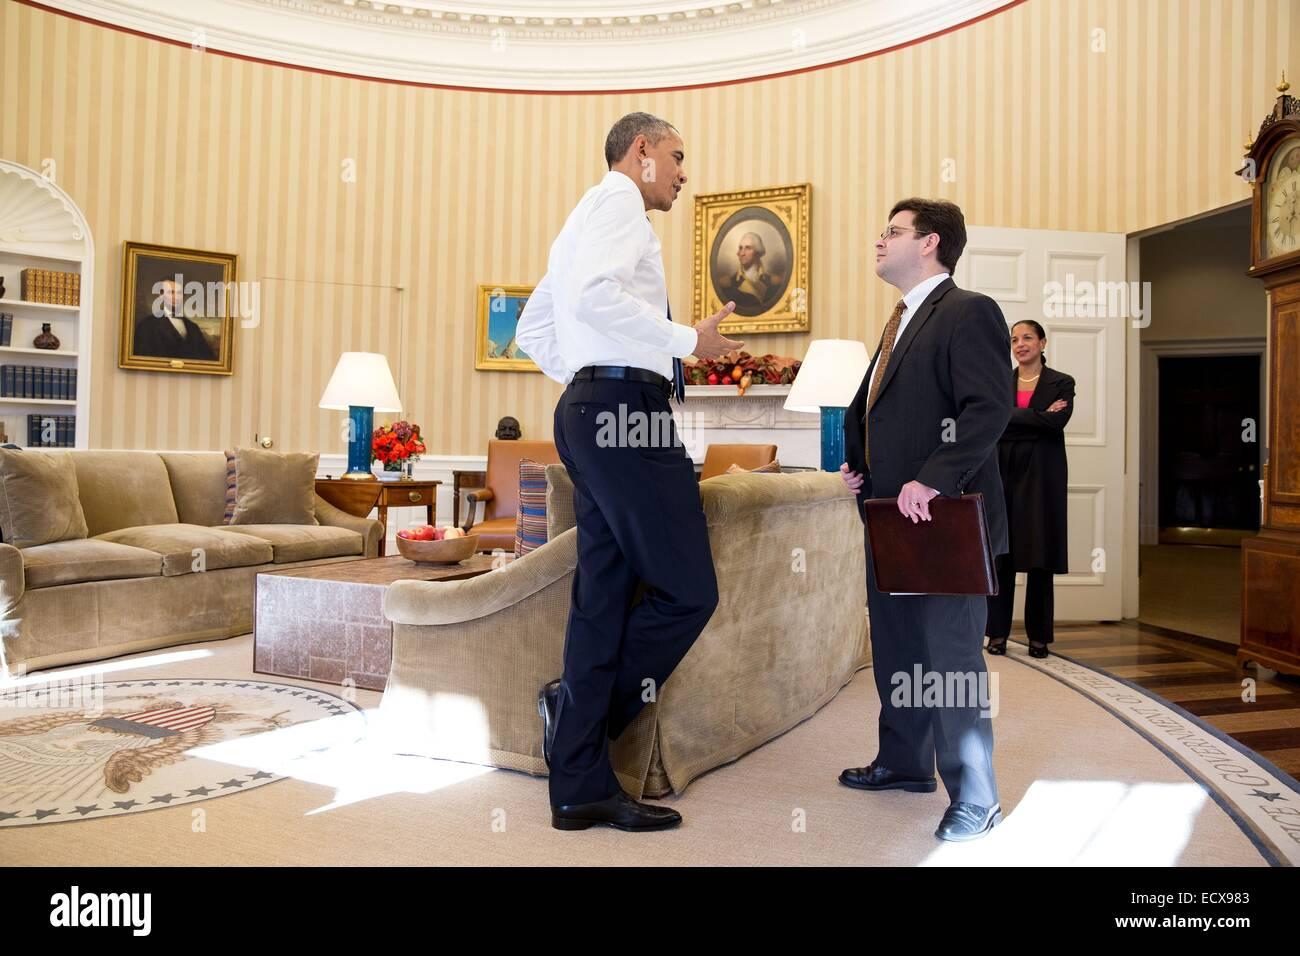 US President Barack Obama talks with Ricardo Zuniga, Senior Director for Western Hemisphere Affairs, after the President - Stock Image